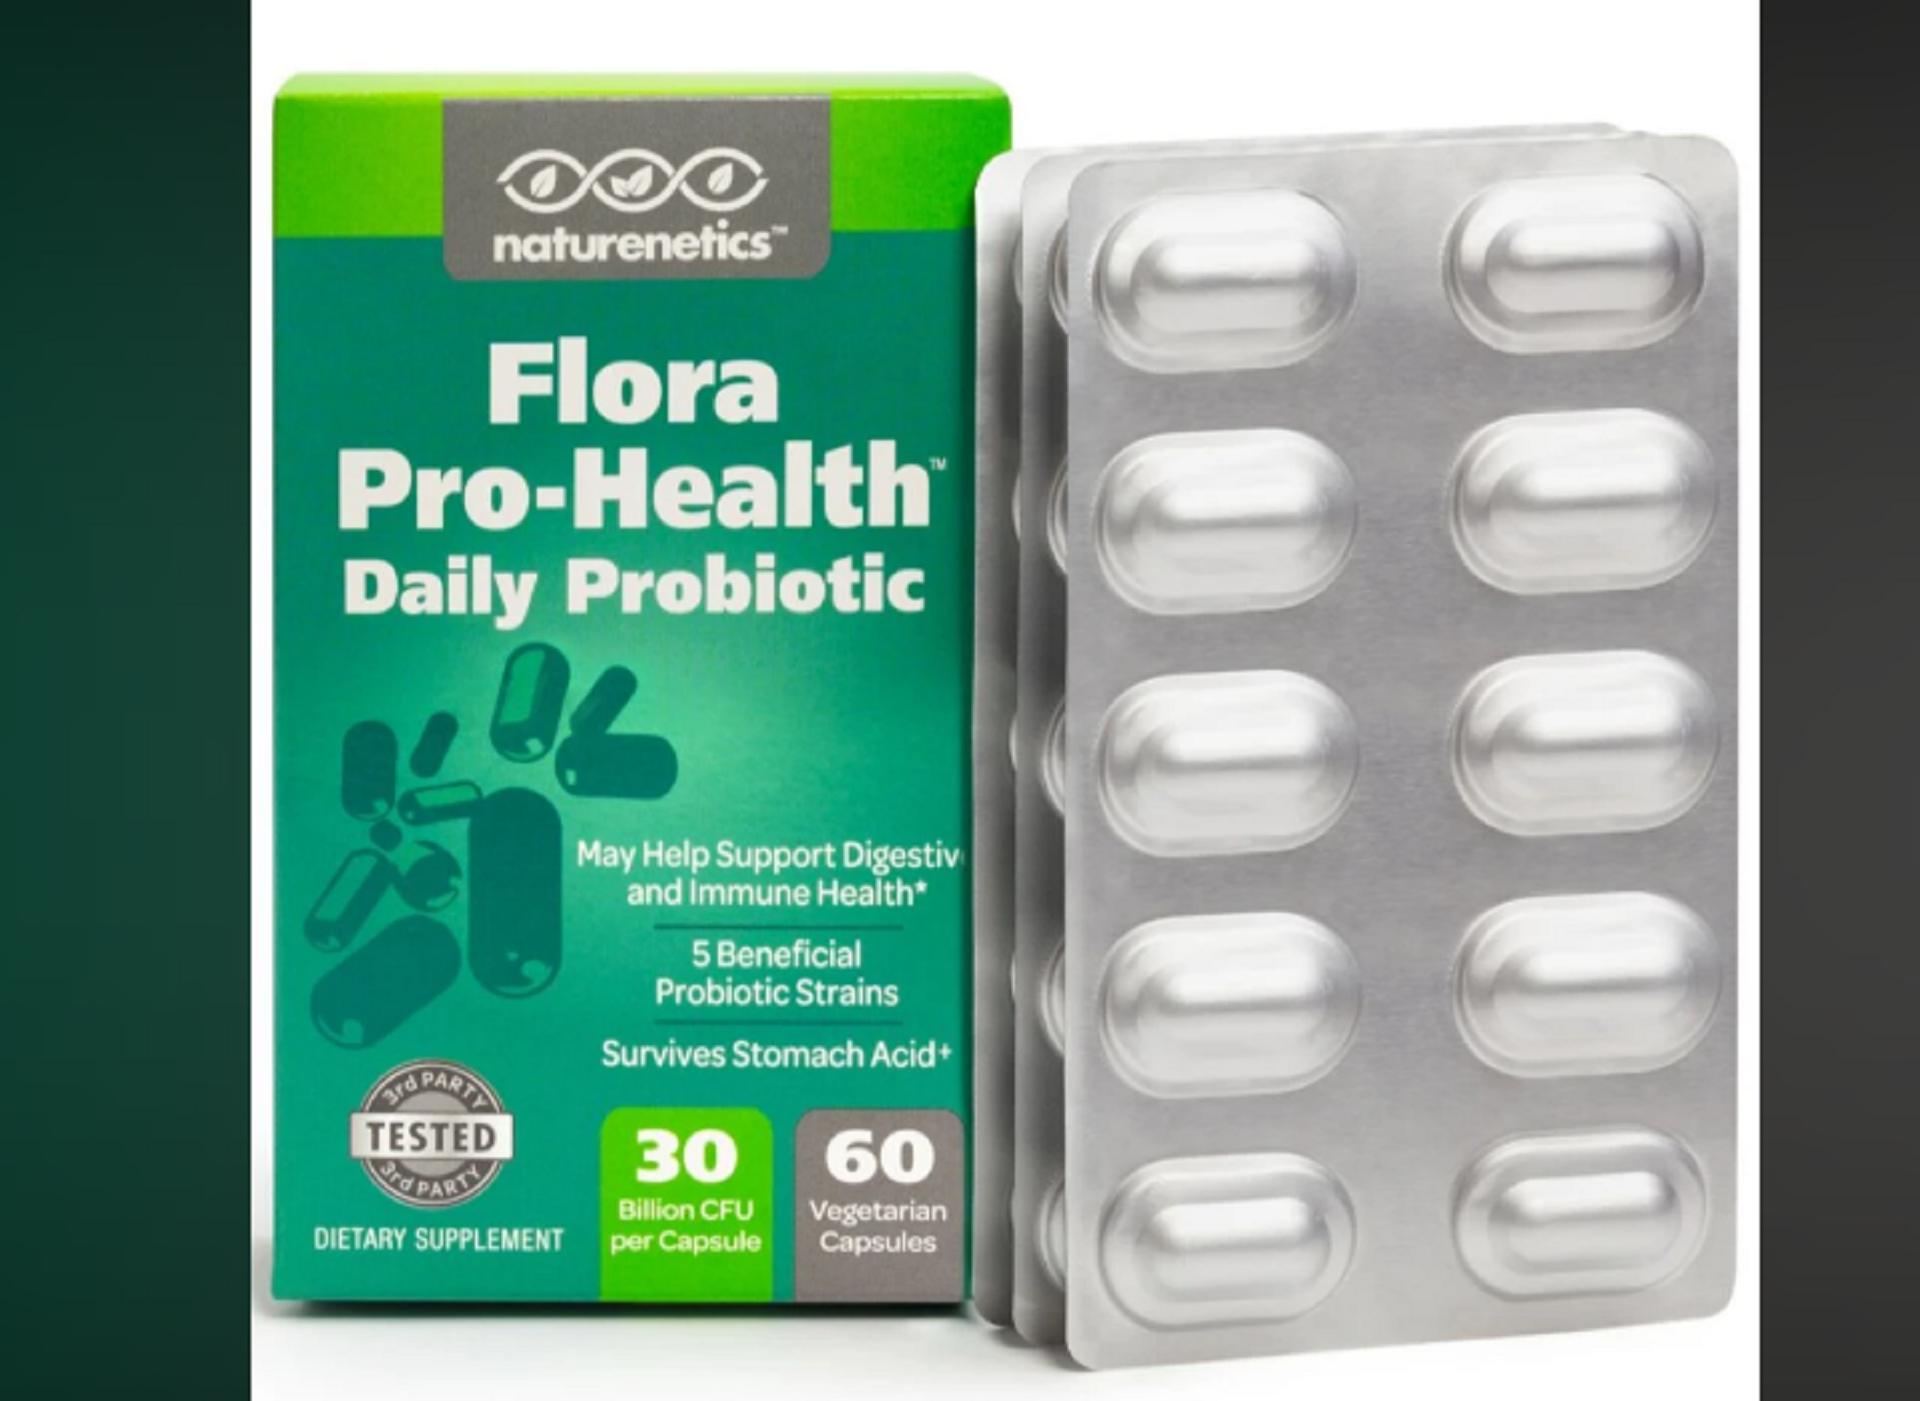 flora pro-health probiotic